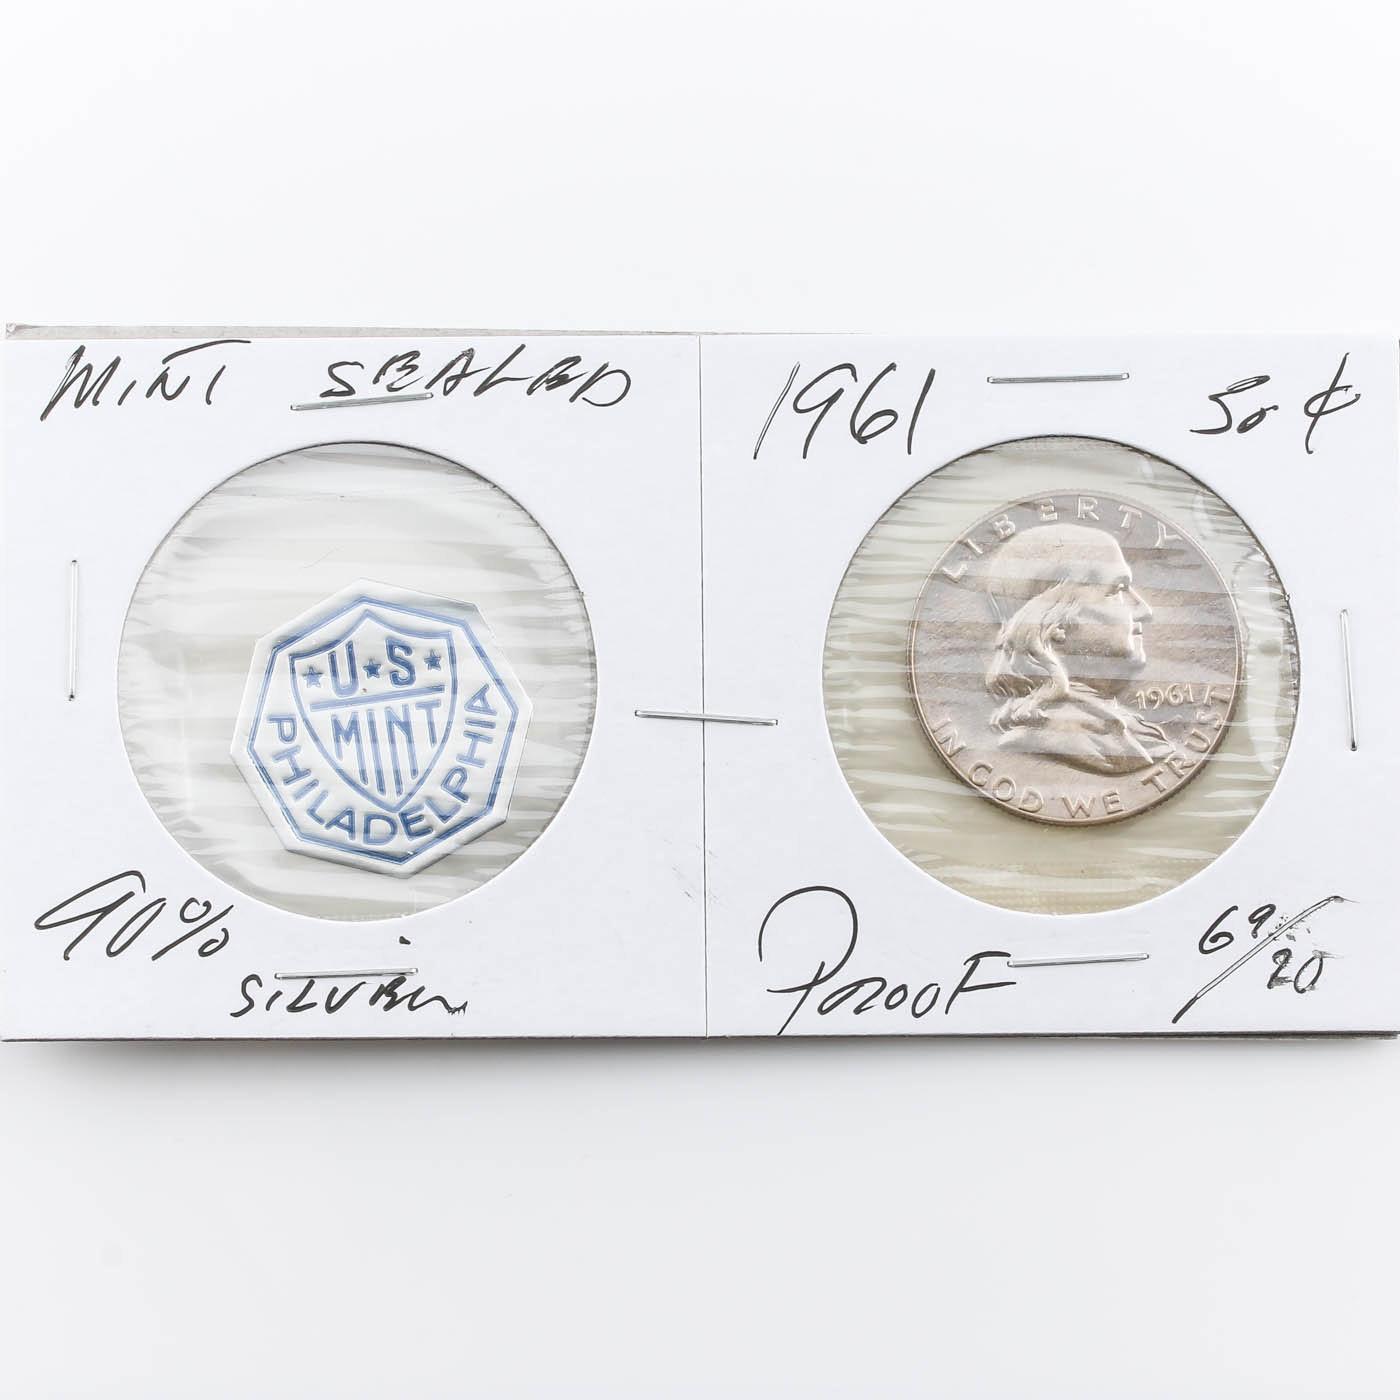 1961 Franklin Silver Half Dollar Proof Coin